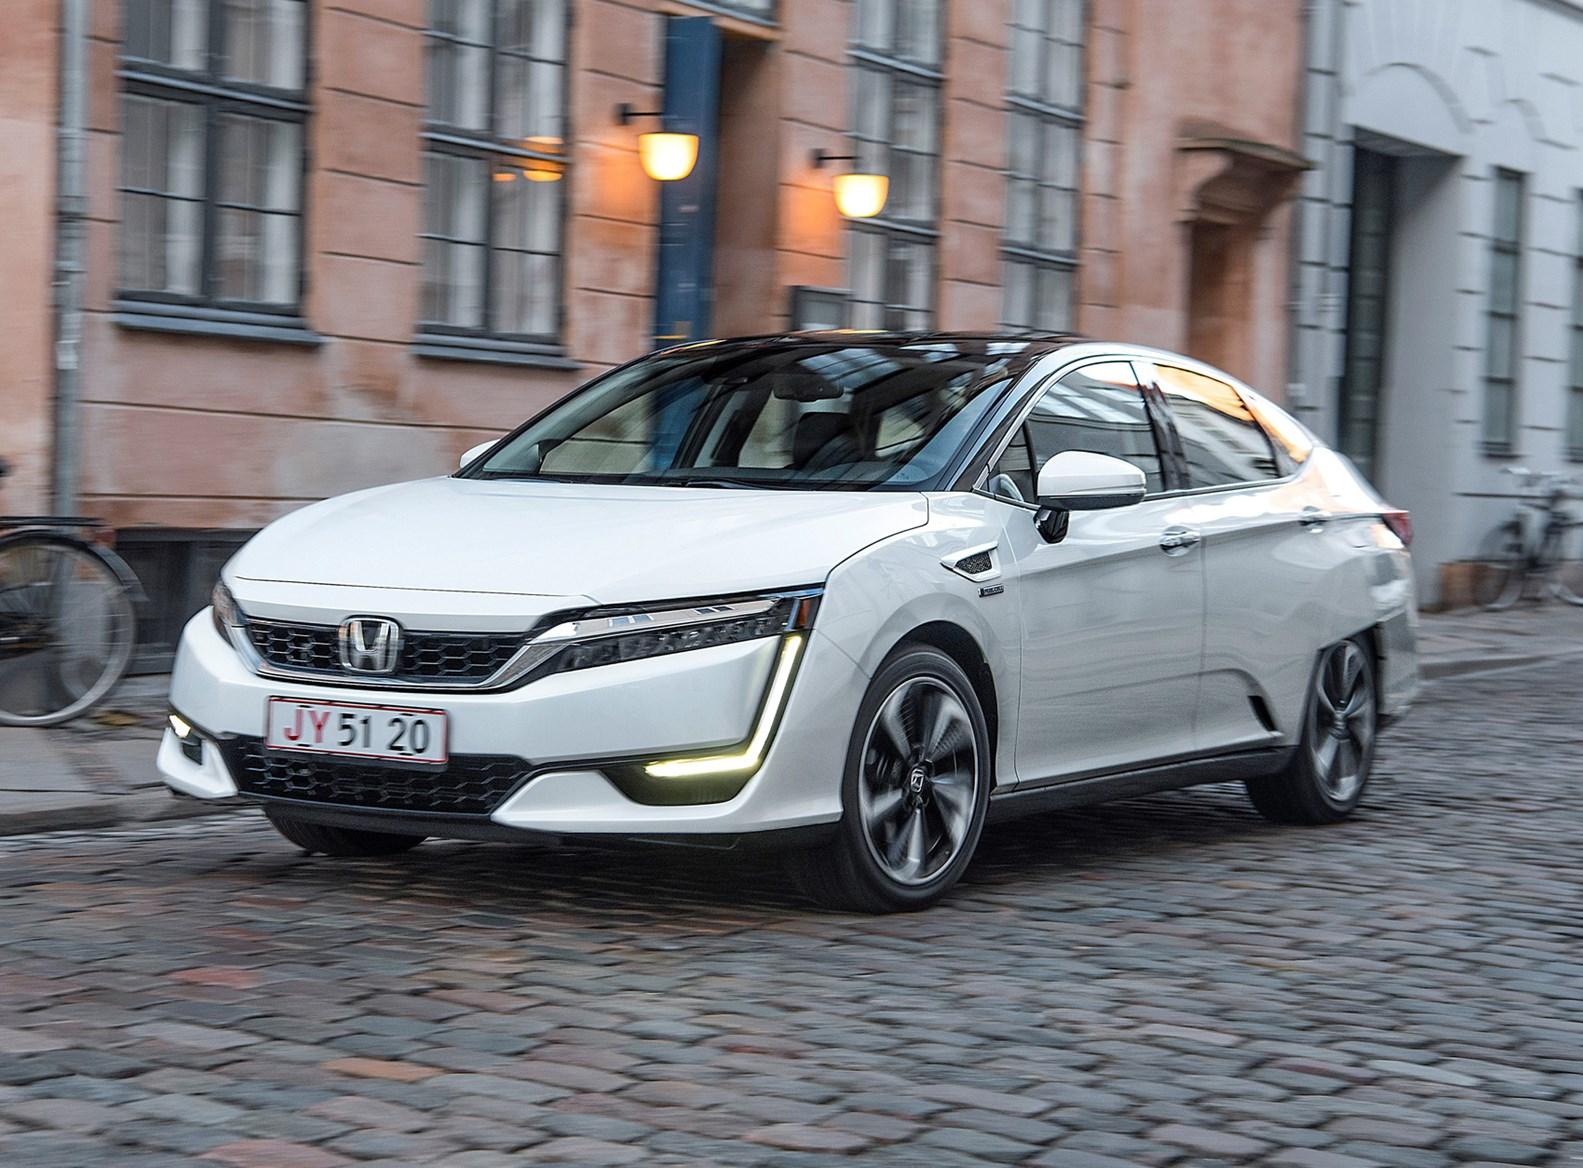 Honda Clarity Saloon Review